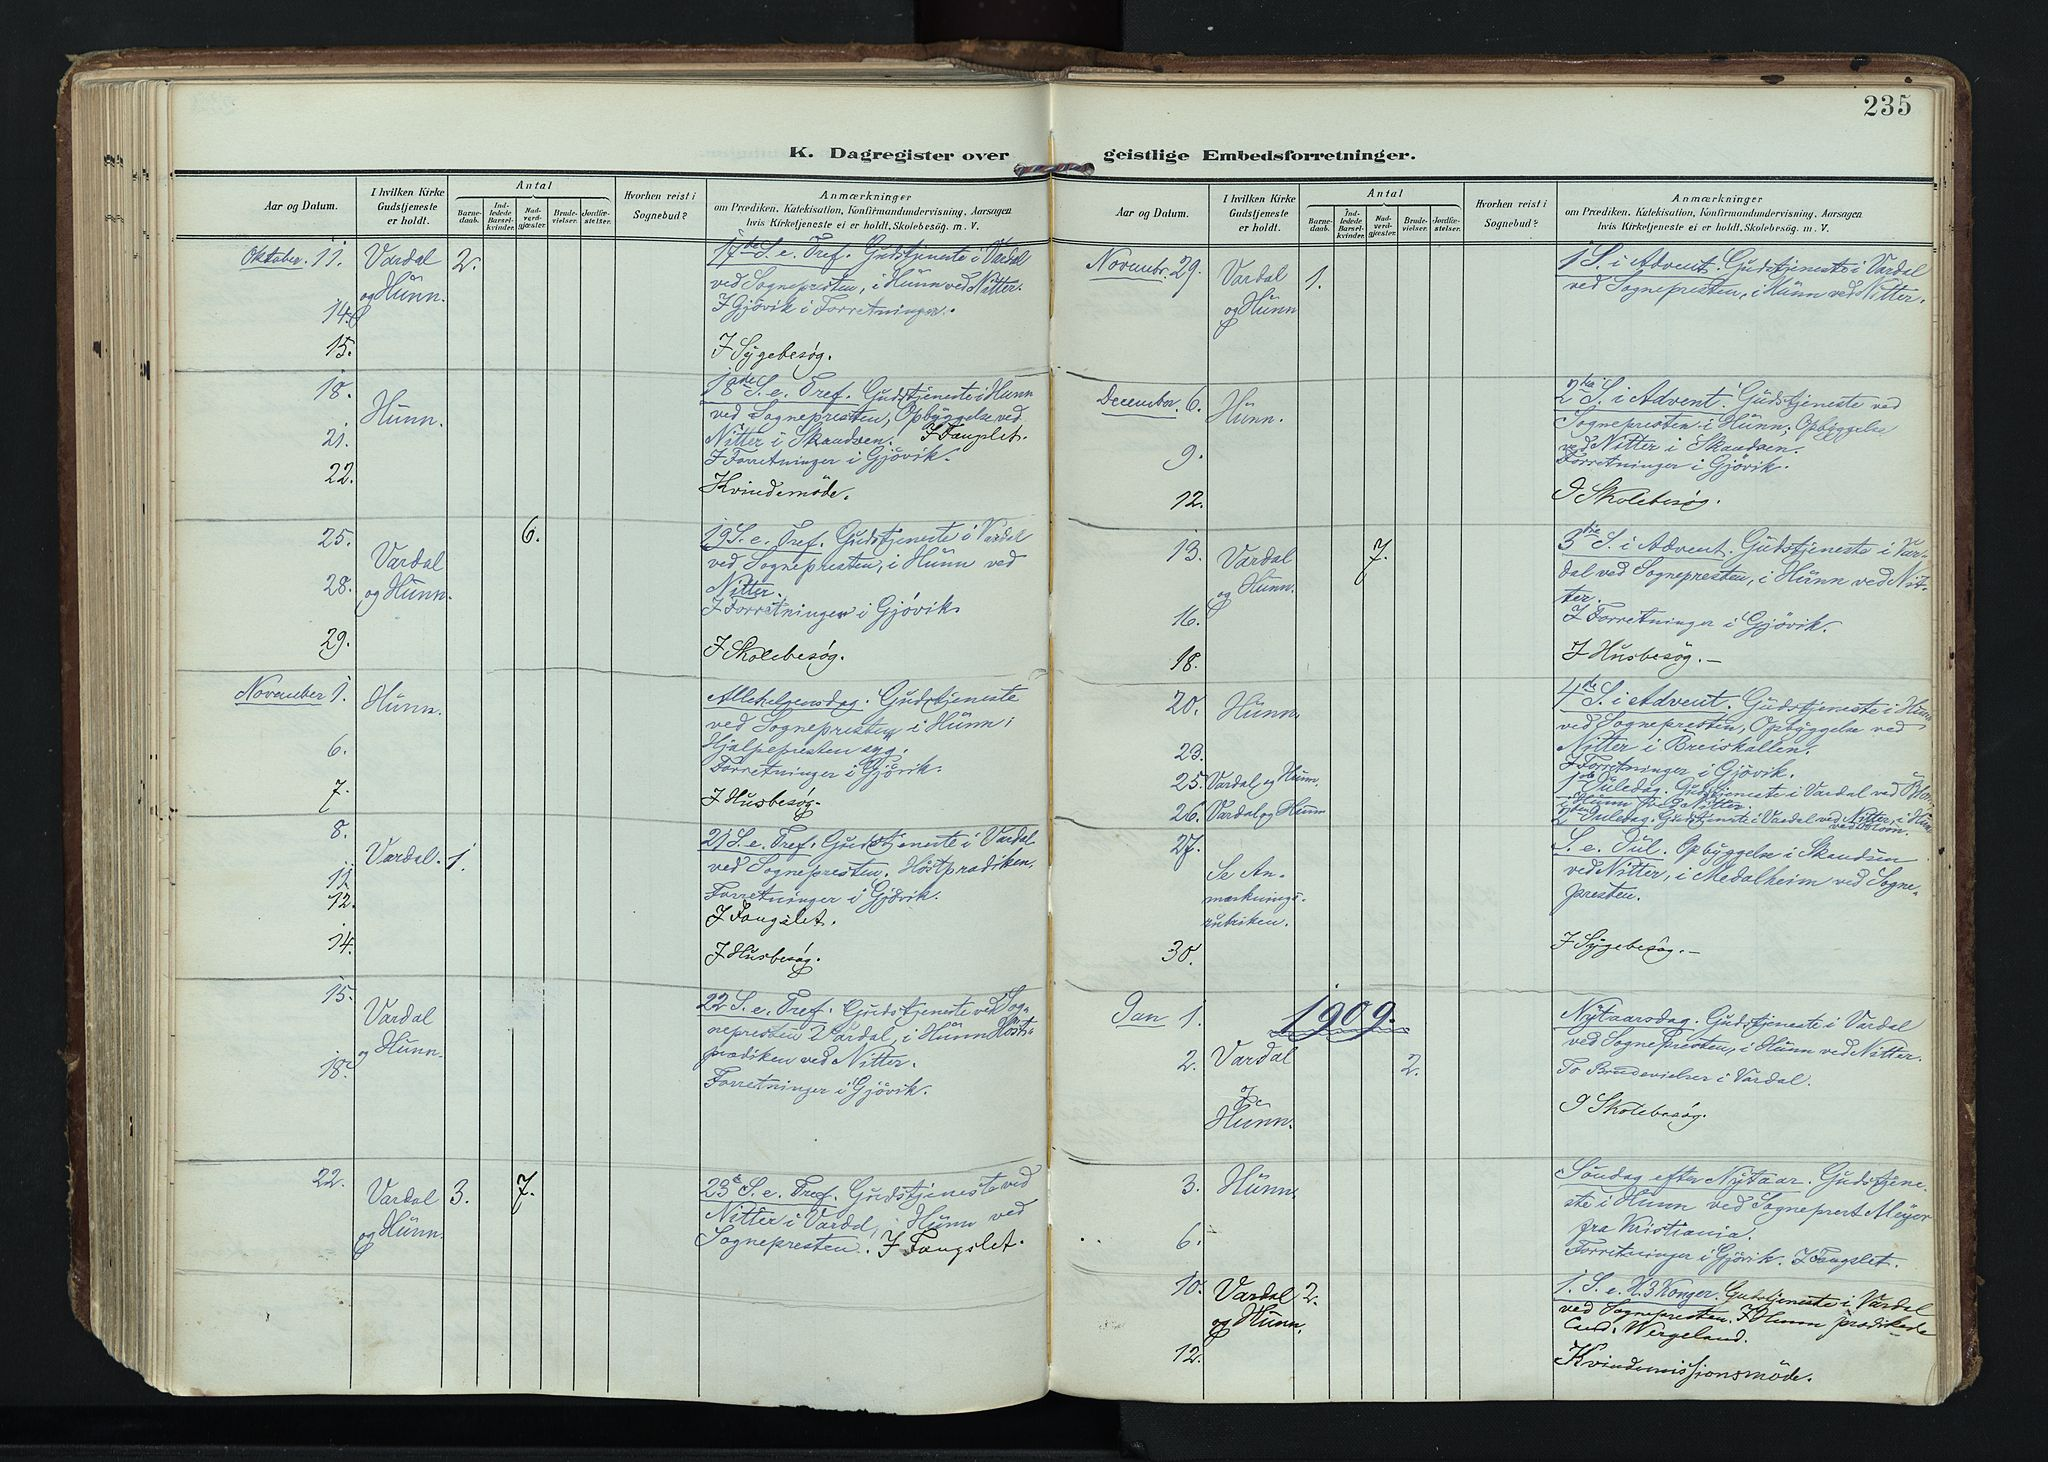 SAH, Vardal prestekontor, H/Ha/Haa/L0020: Ministerialbok nr. 20, 1907-1921, s. 235